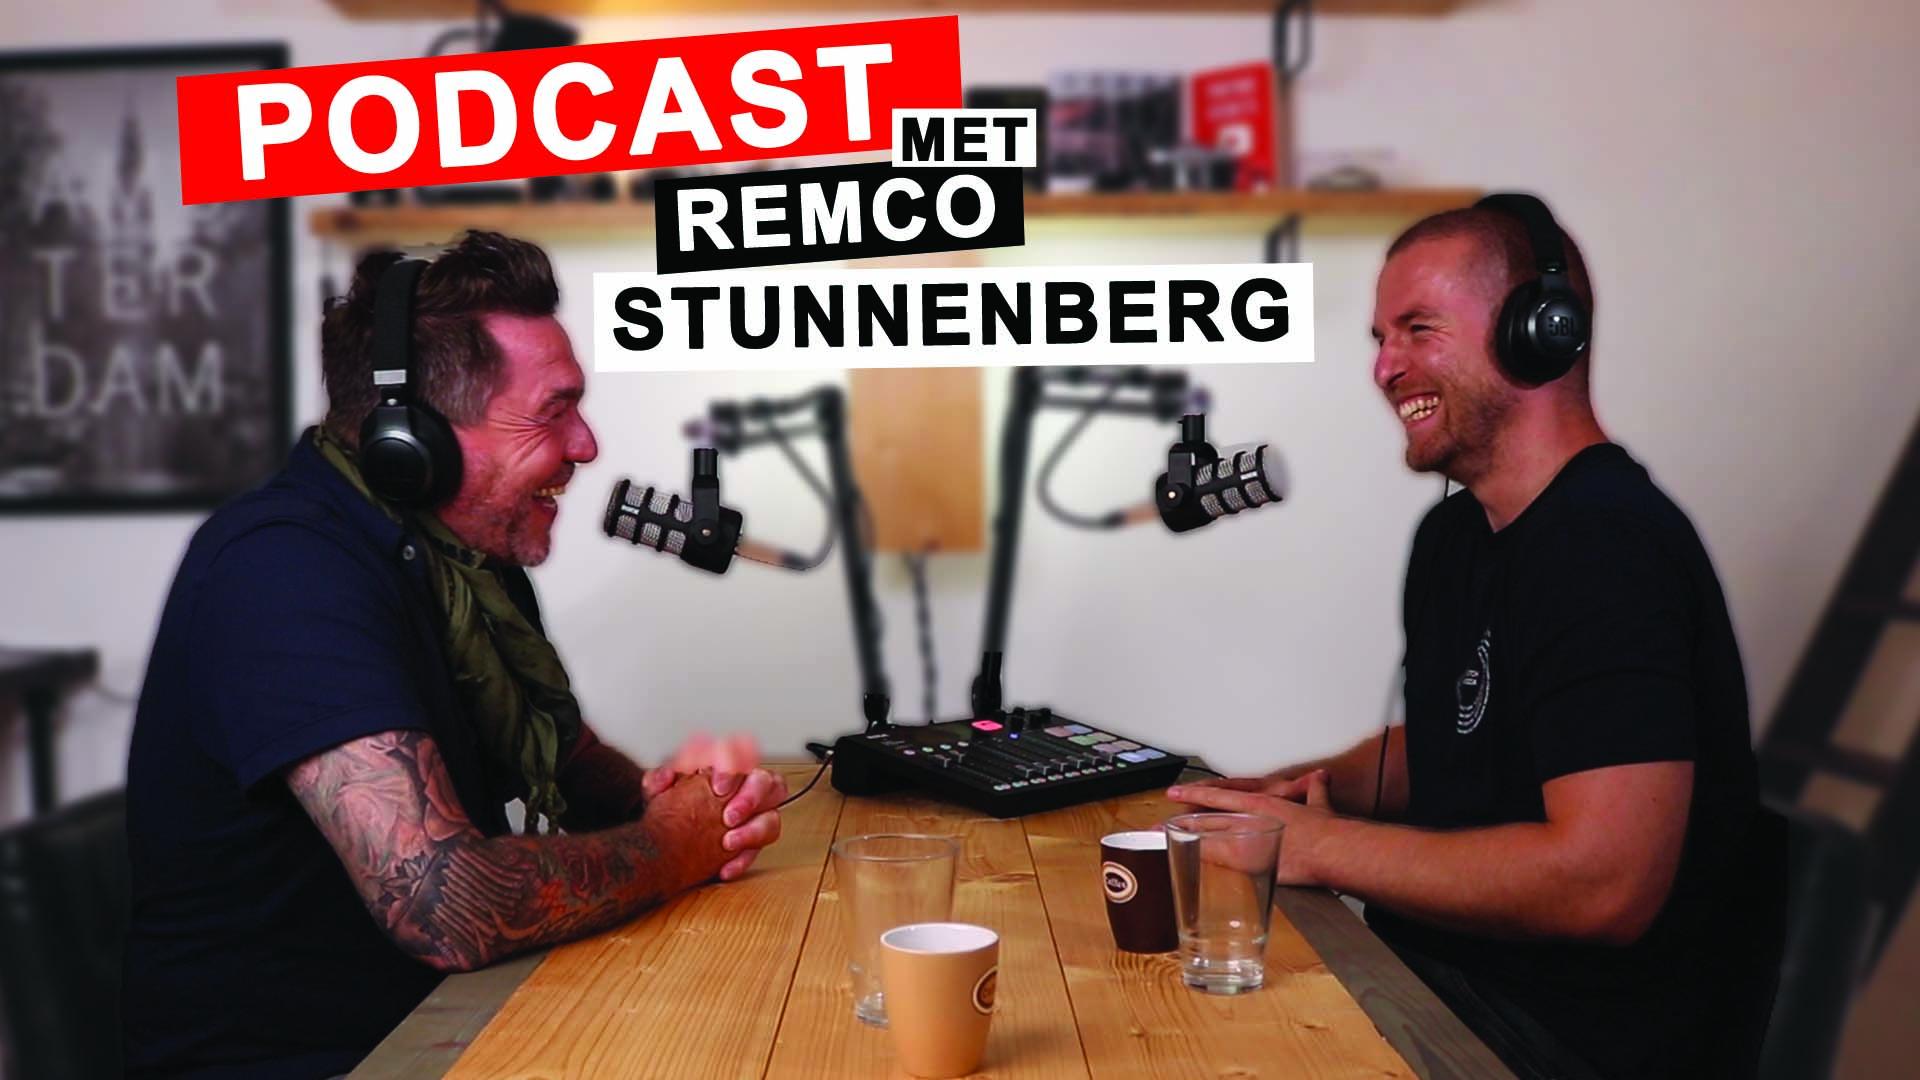 Remco Stunnenberg – Natuurfotograaf en journalist